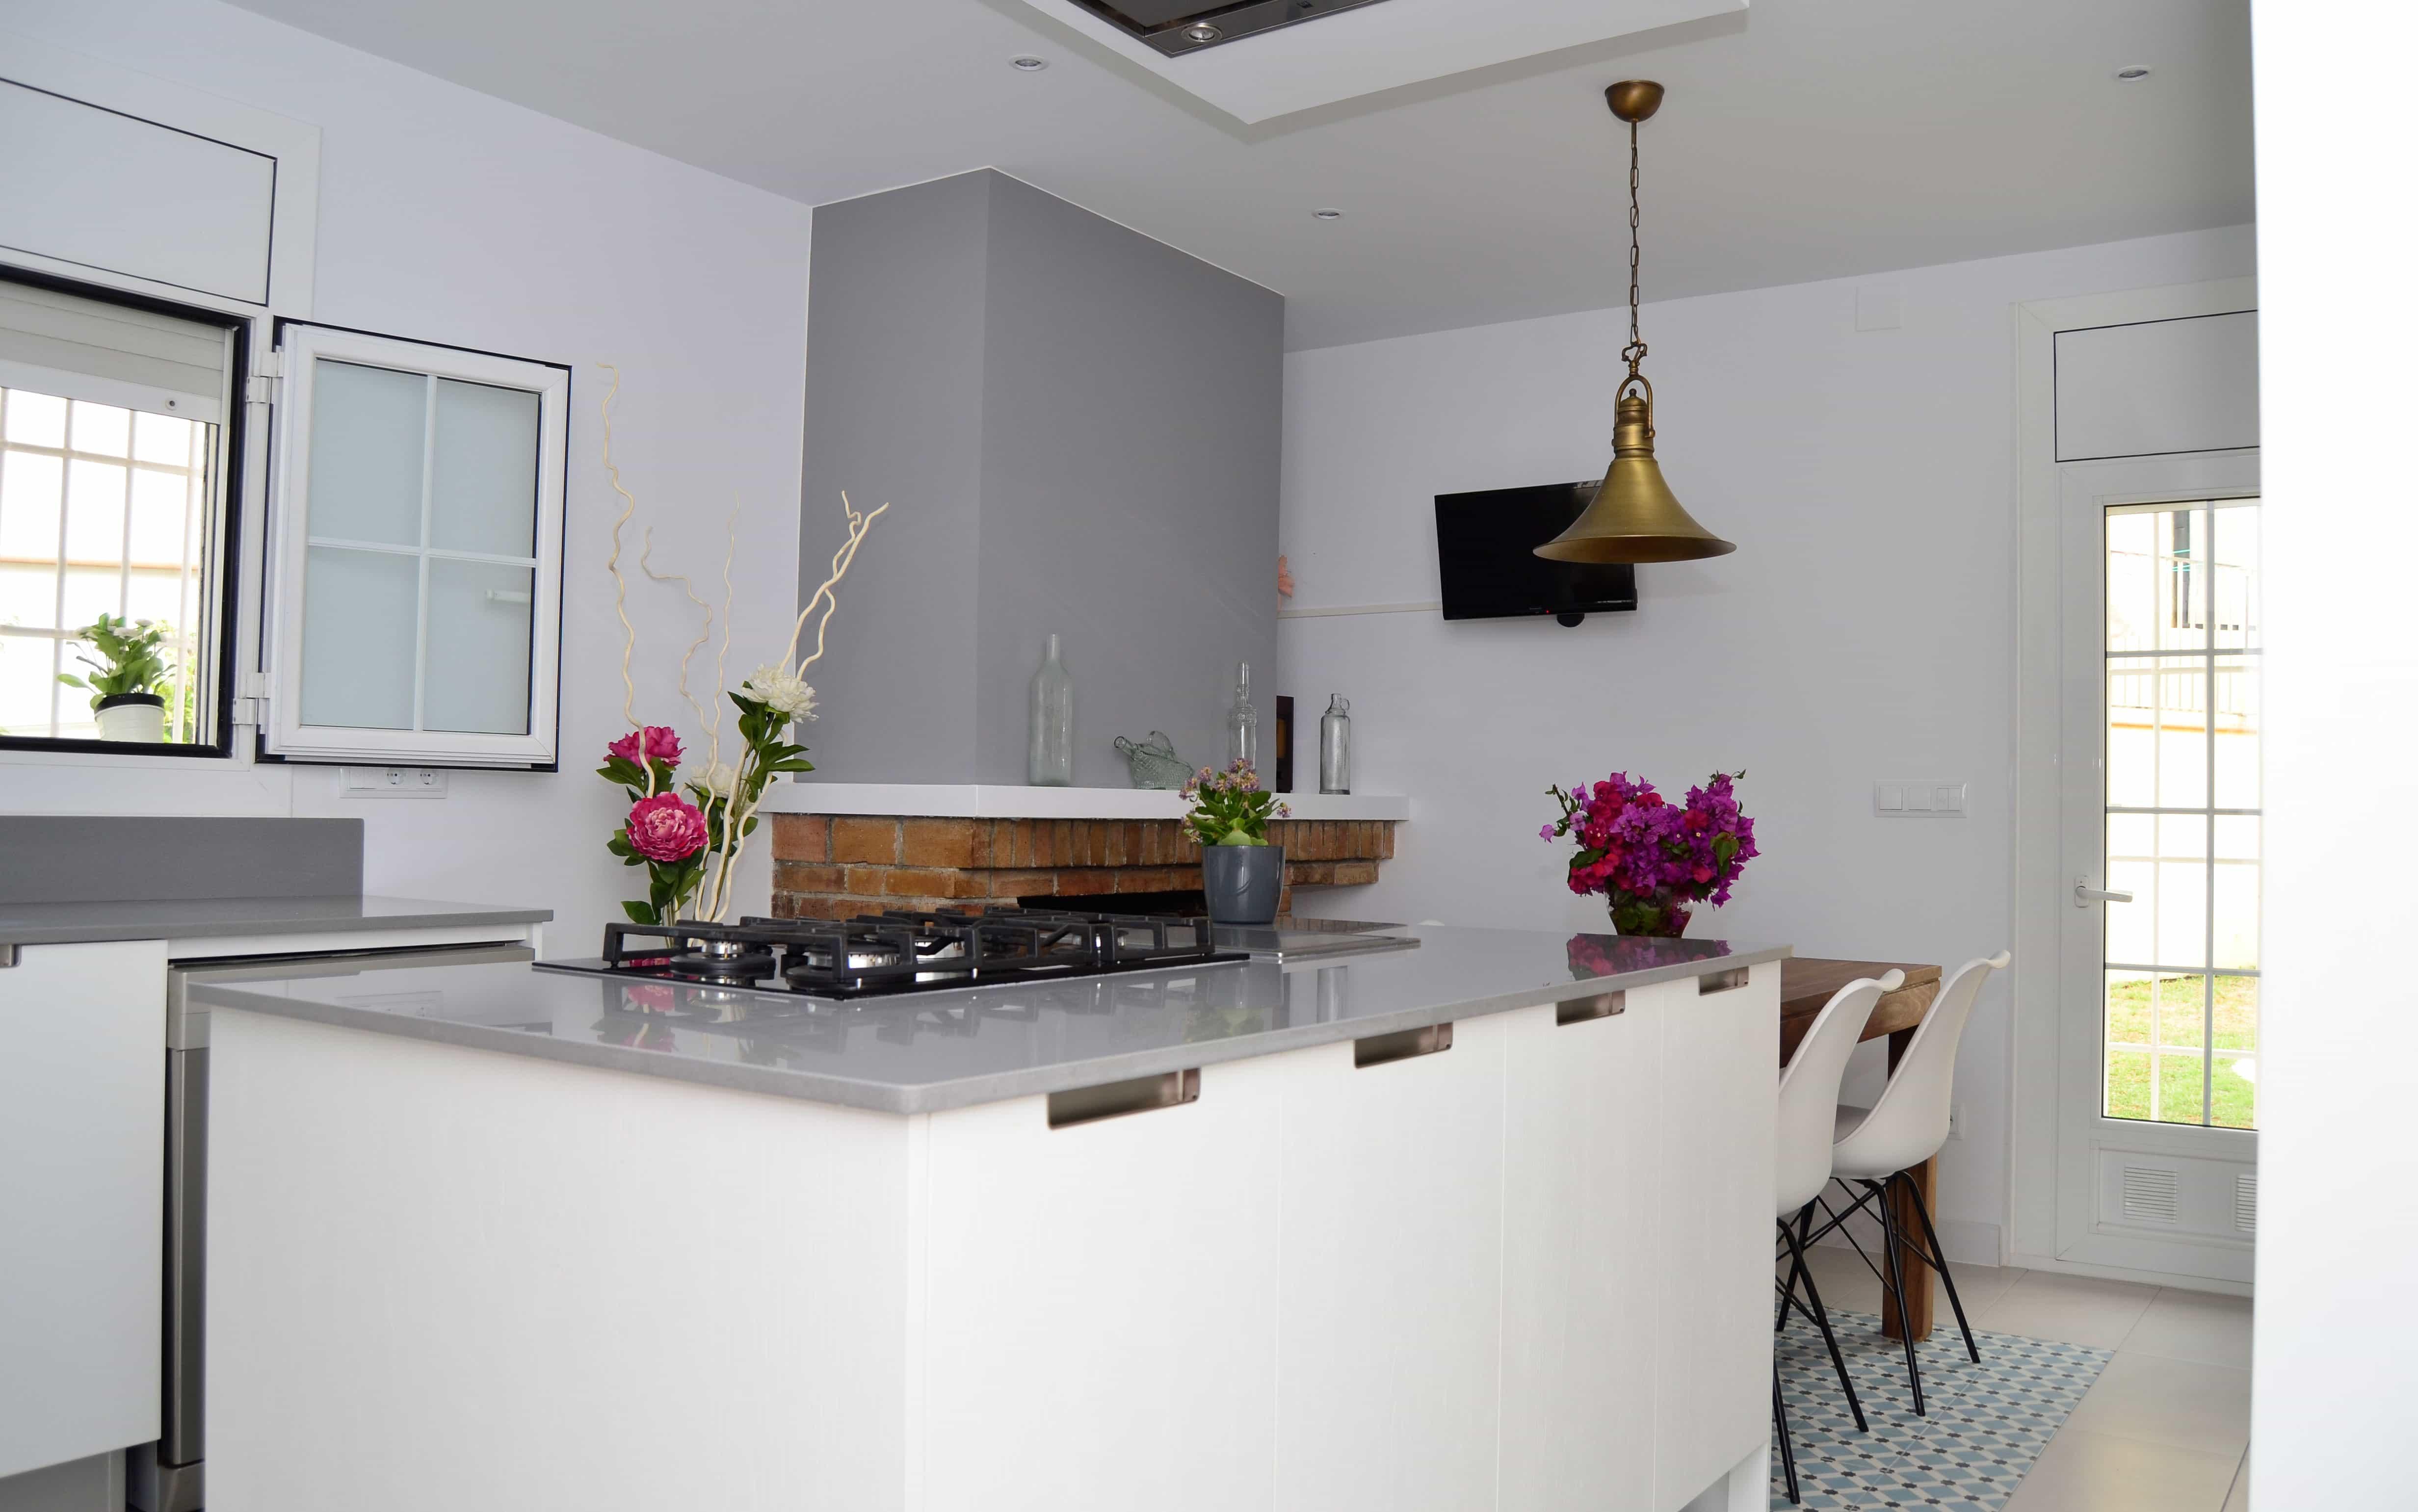 Cocina integrada en salón con isla Mas Ram Contract Solutions